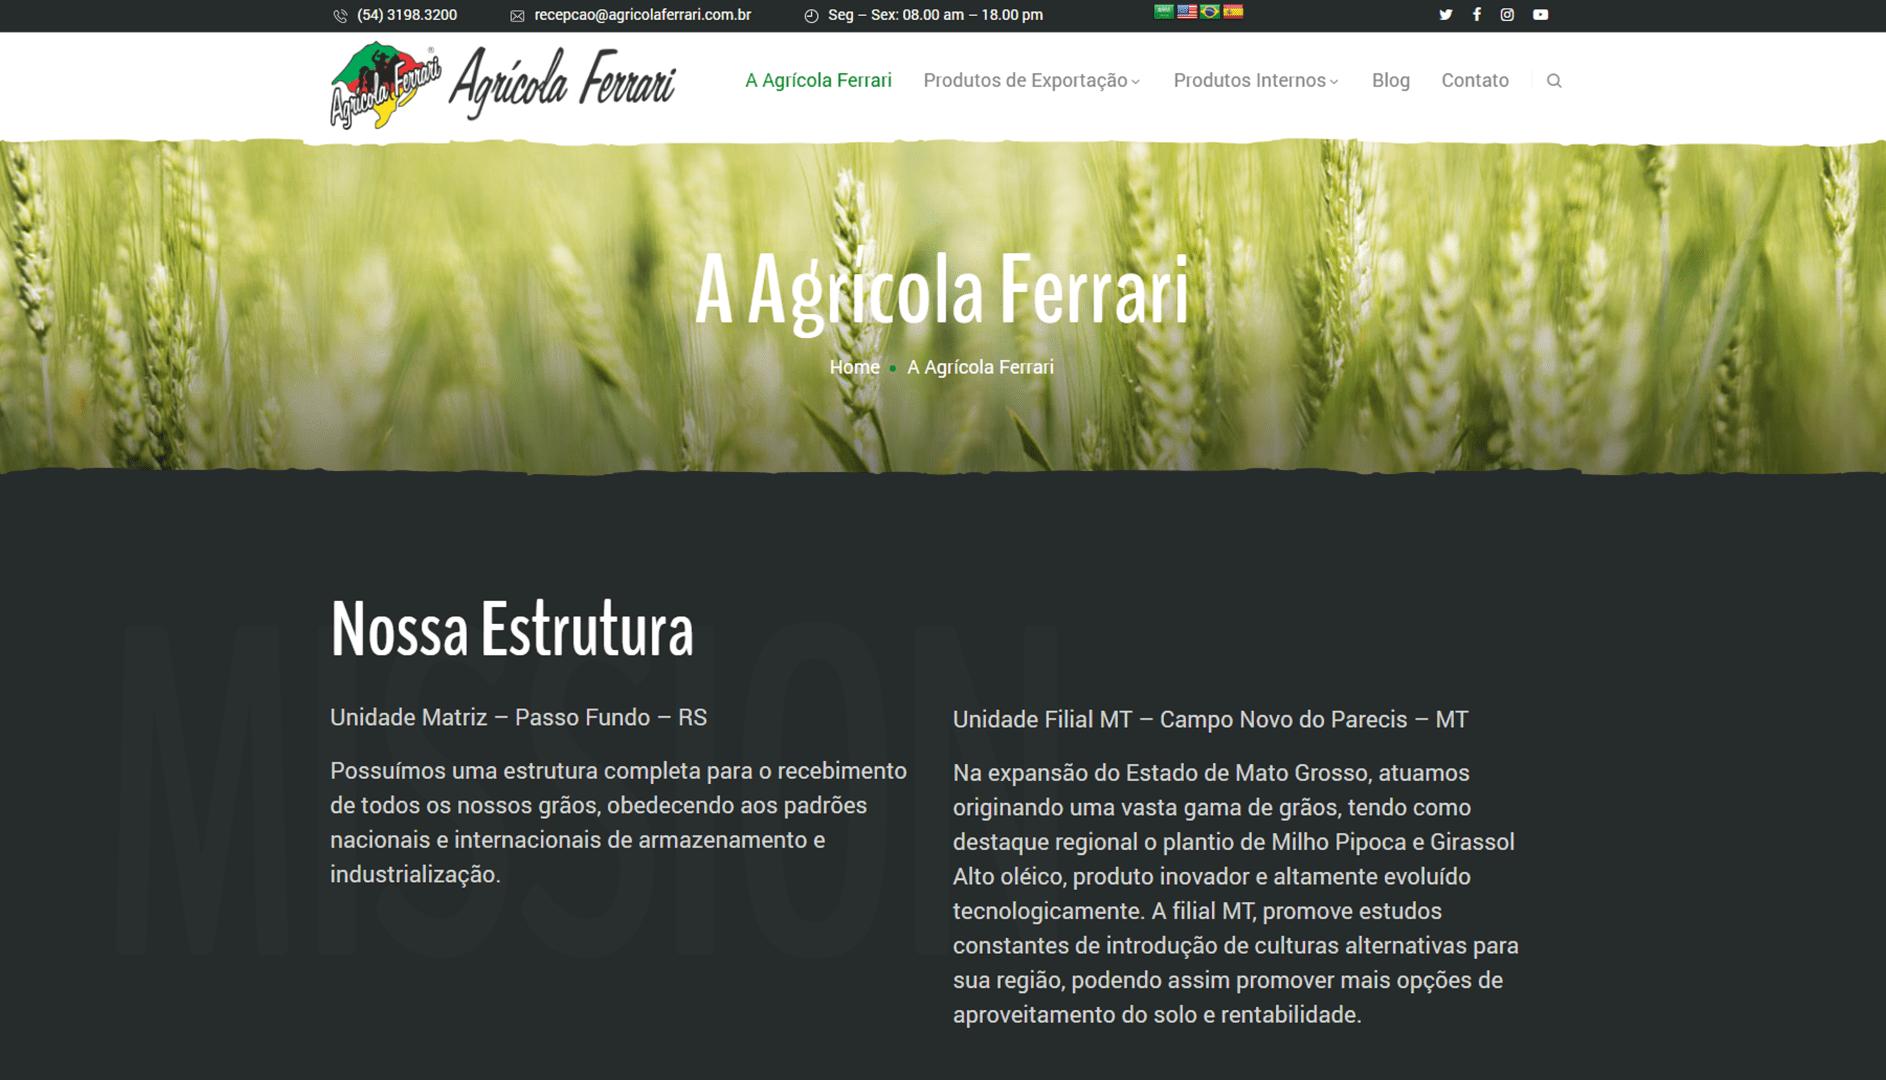 https://www.6i.com.br/case/agrcola-ferrari/